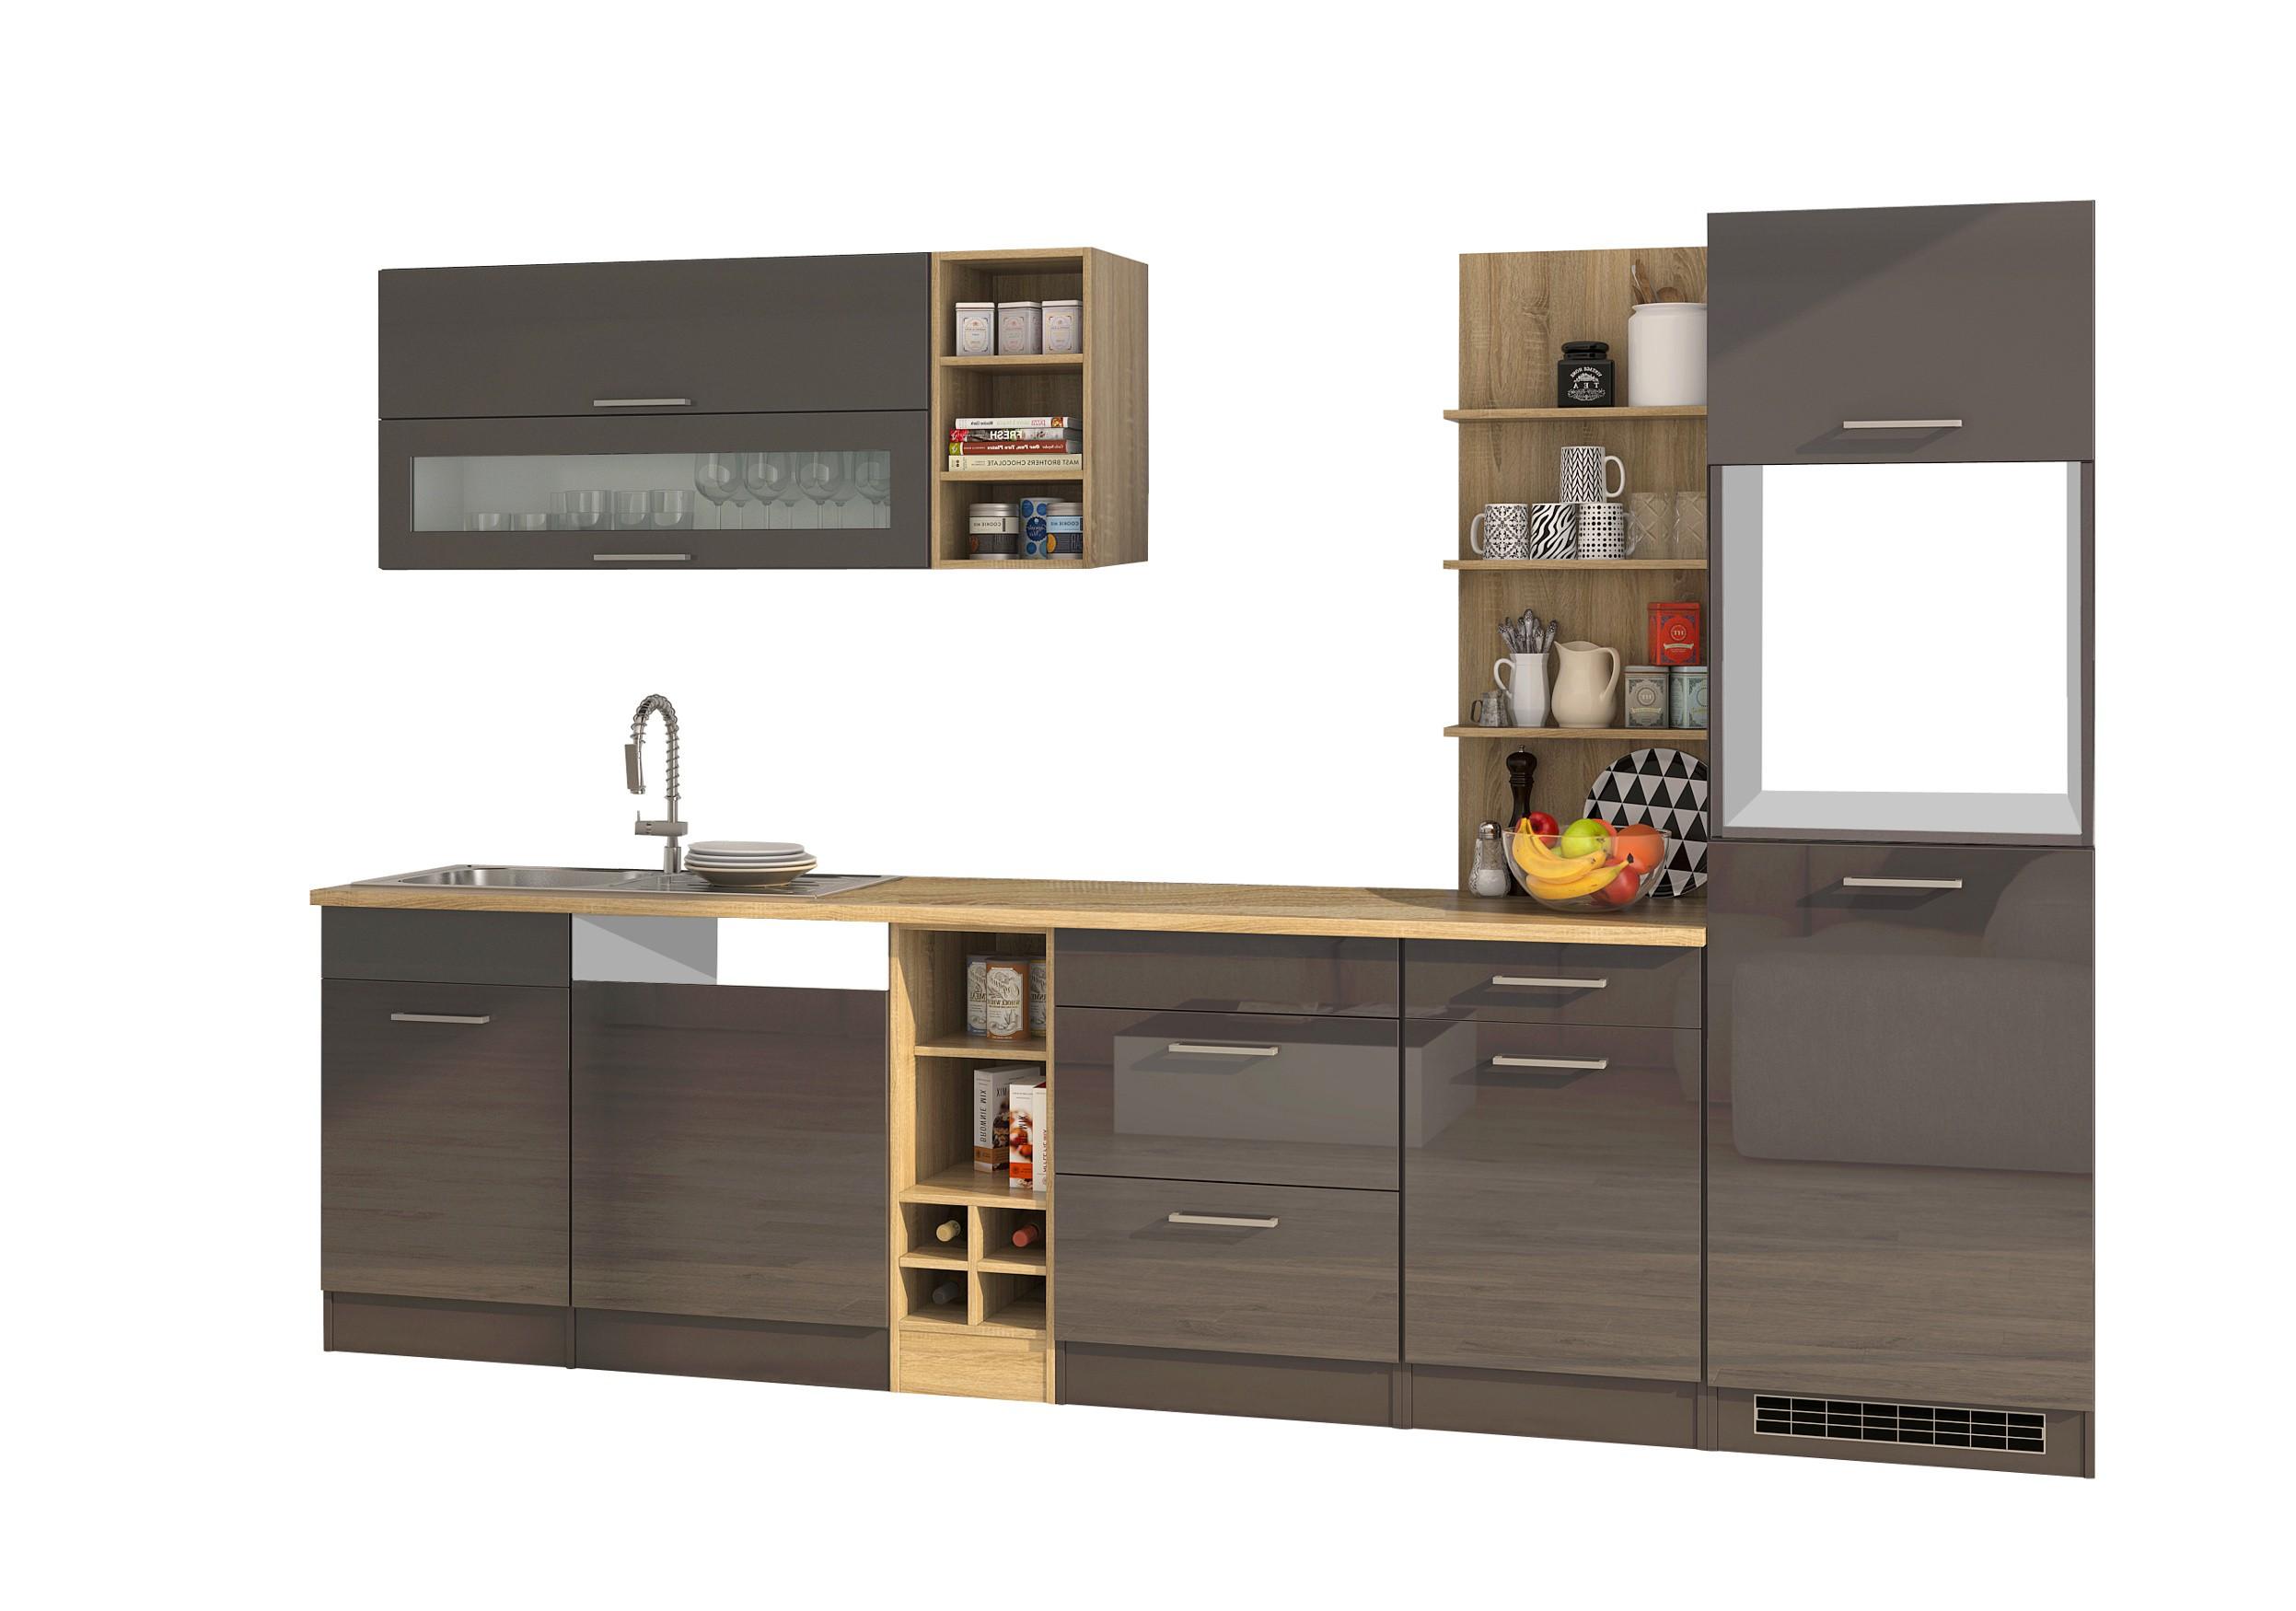 einbauk che ohne elektroger te k chenzeile ohne ger te 310. Black Bedroom Furniture Sets. Home Design Ideas